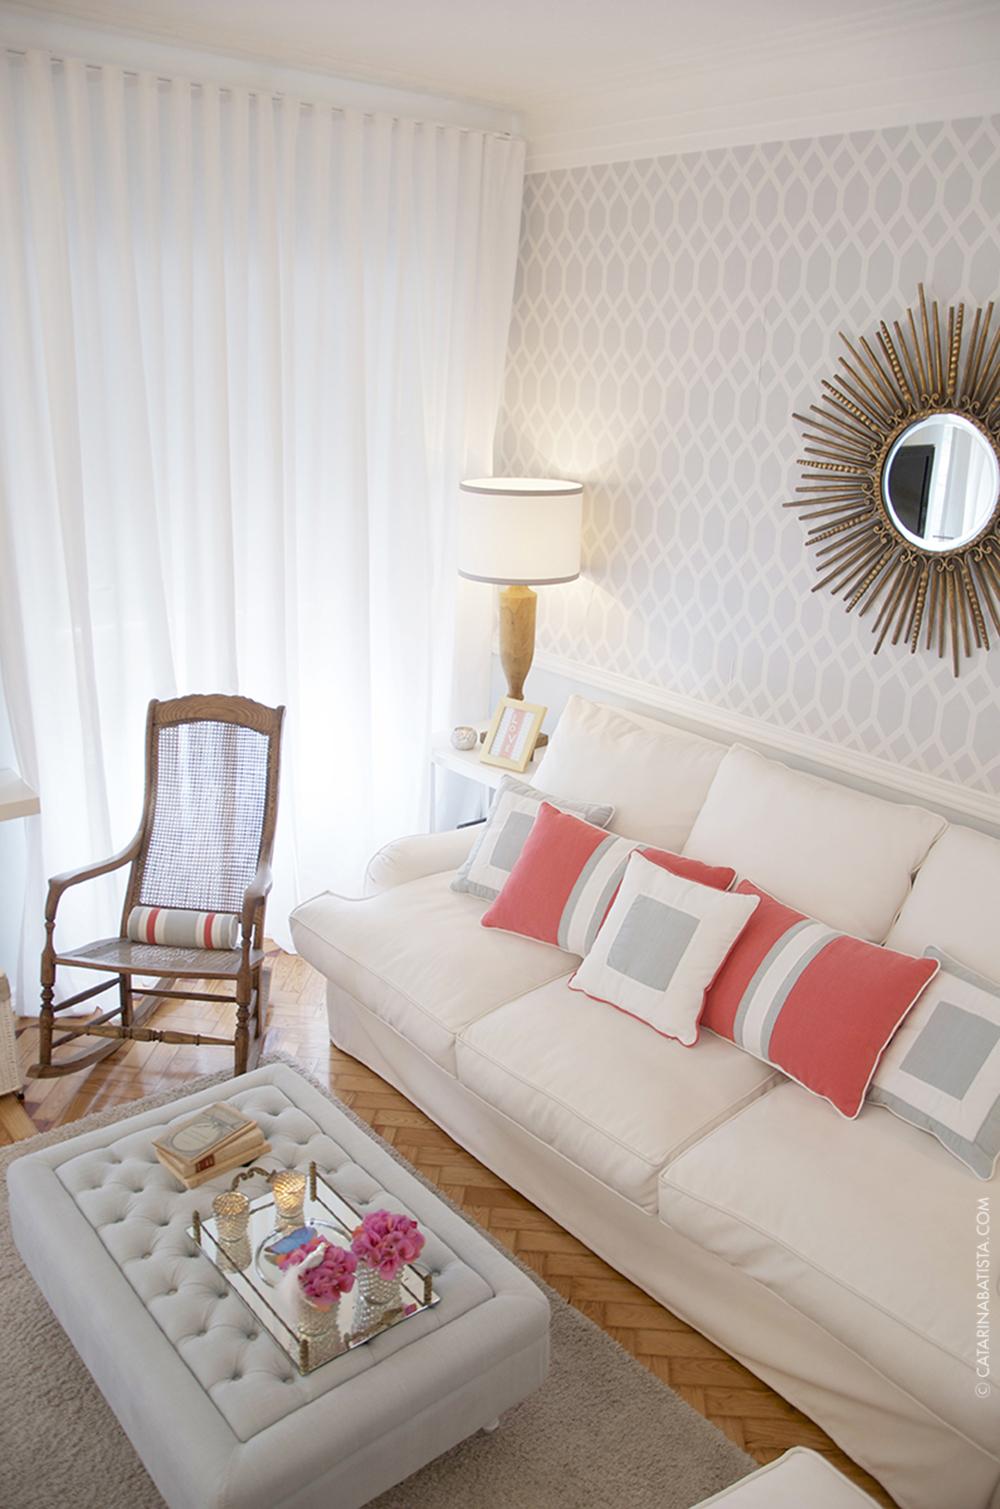 07-catarina-batista-arquitectura-design-interior-decoracao--apartamento-quarto-bedroom-livingroom-sala.jpg